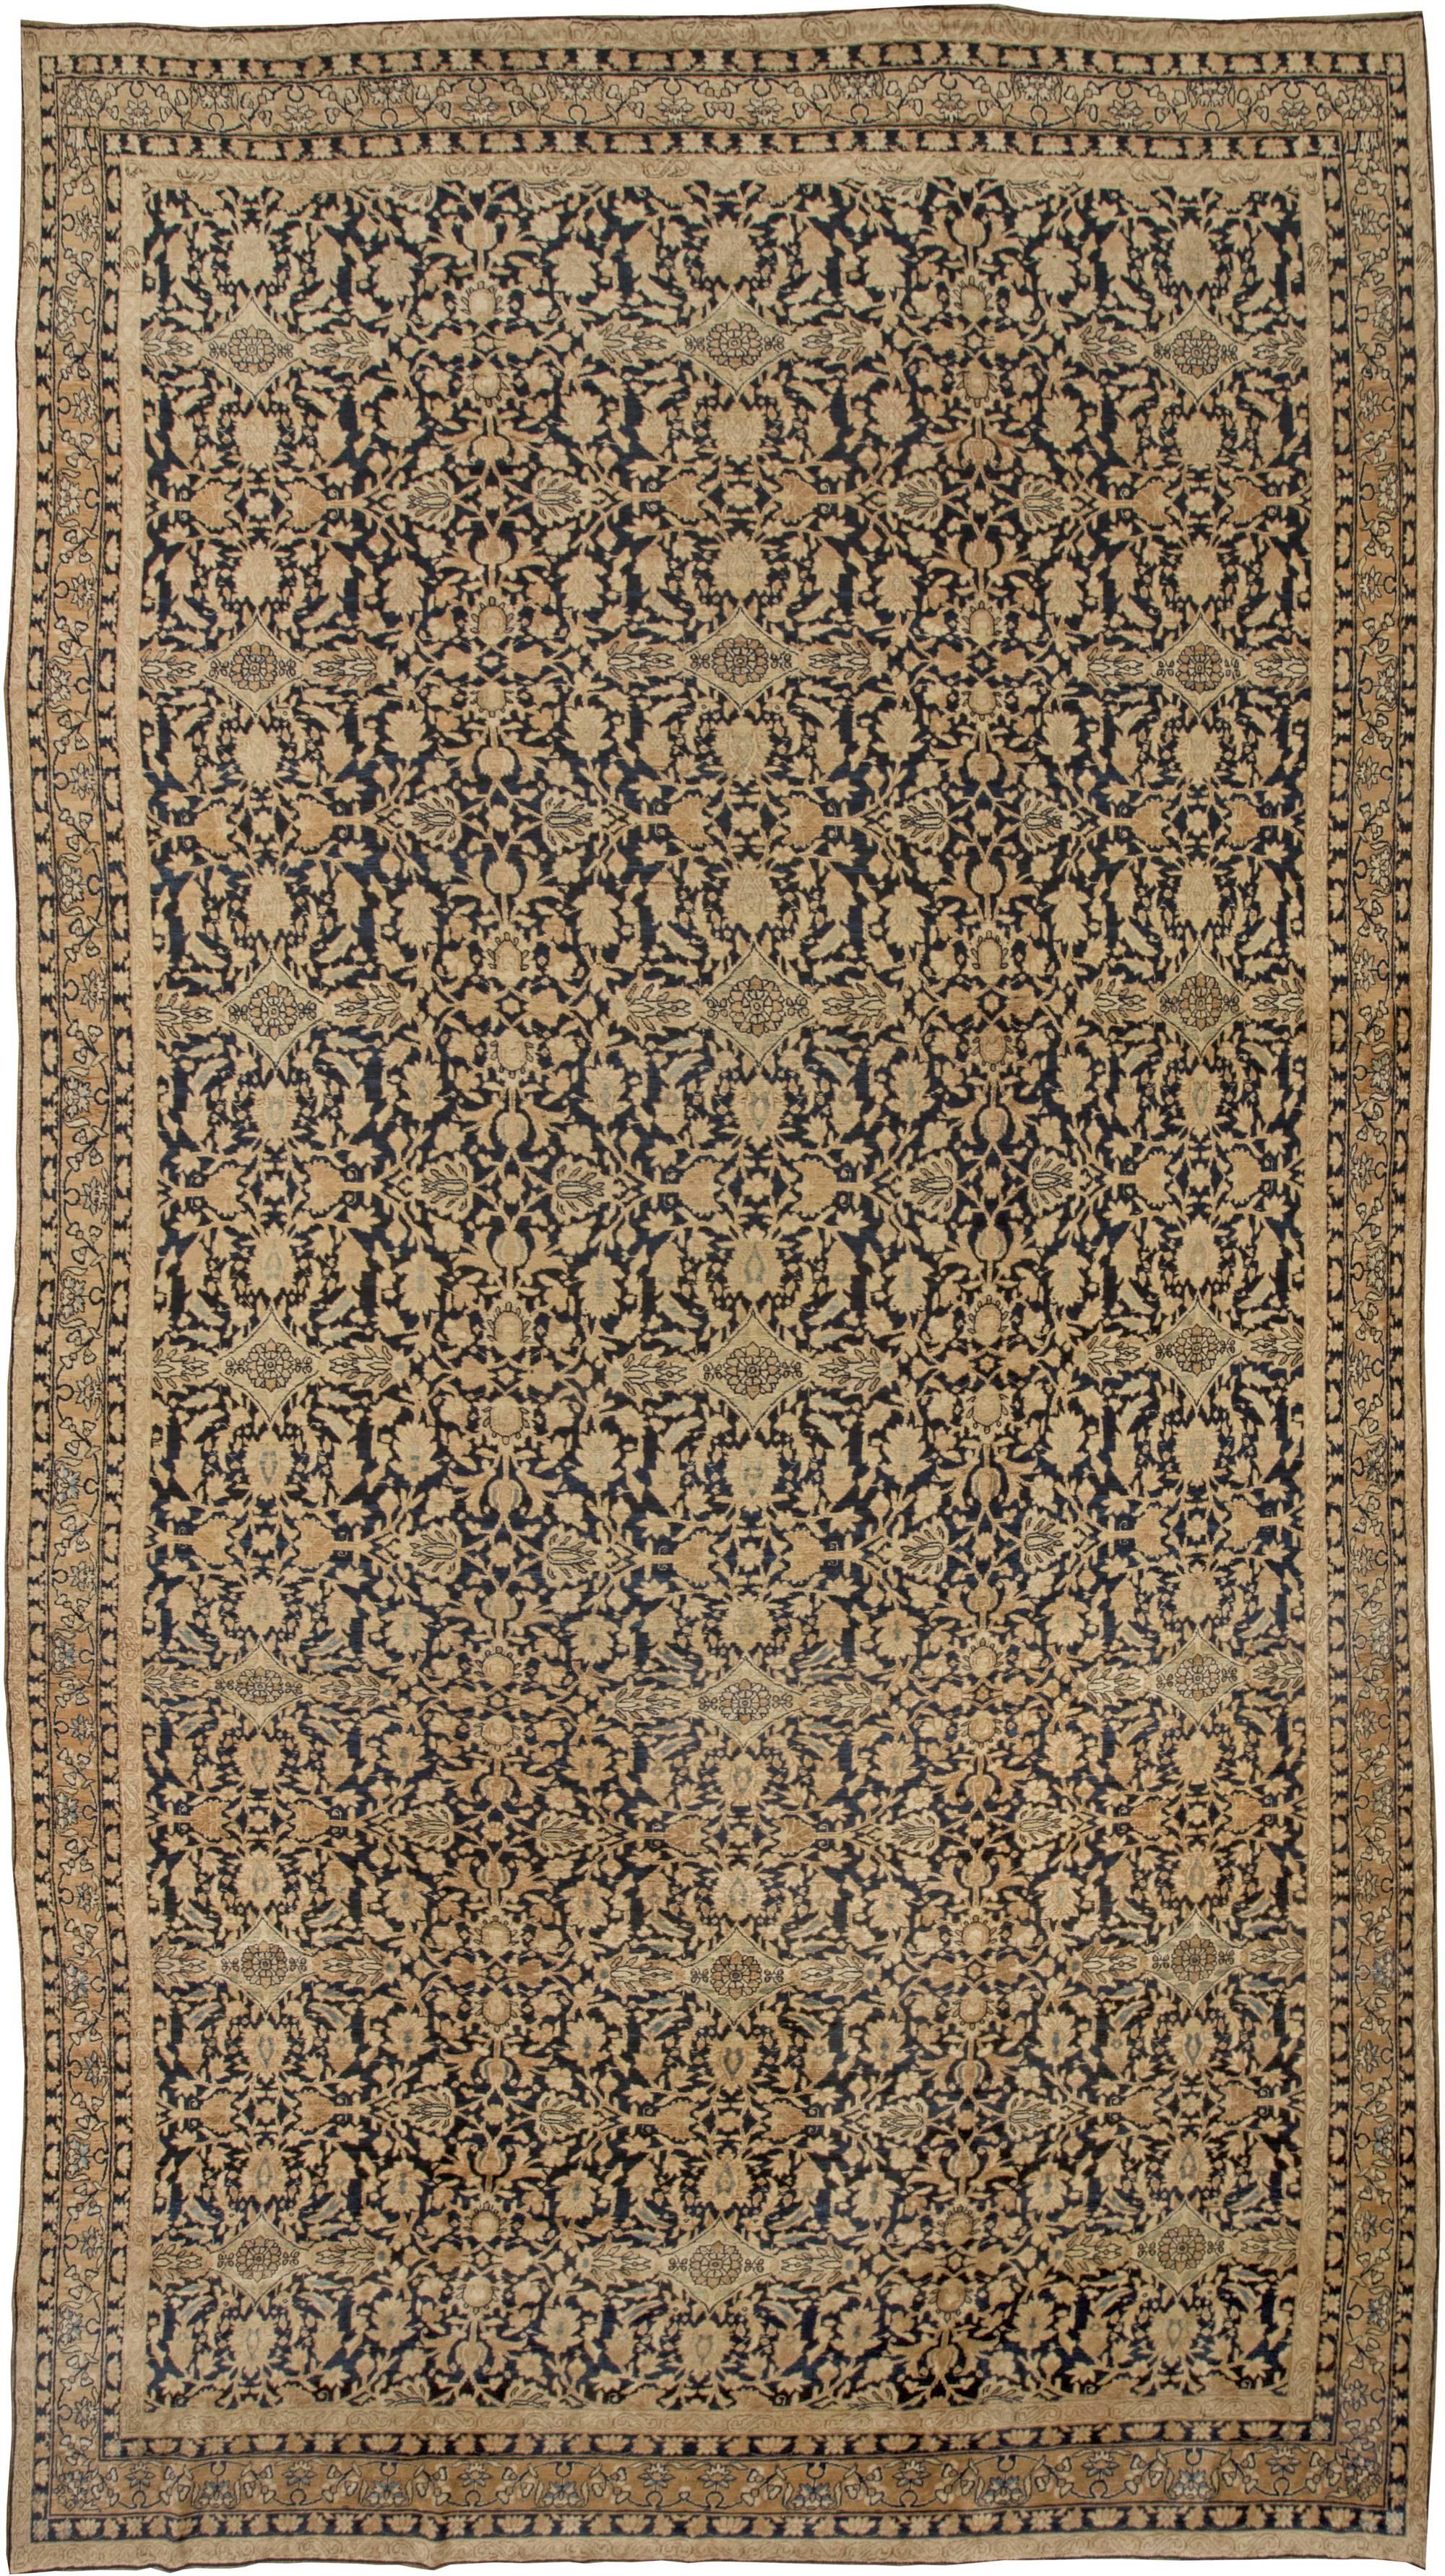 Vintage Persian Kirman Carpet BB2445